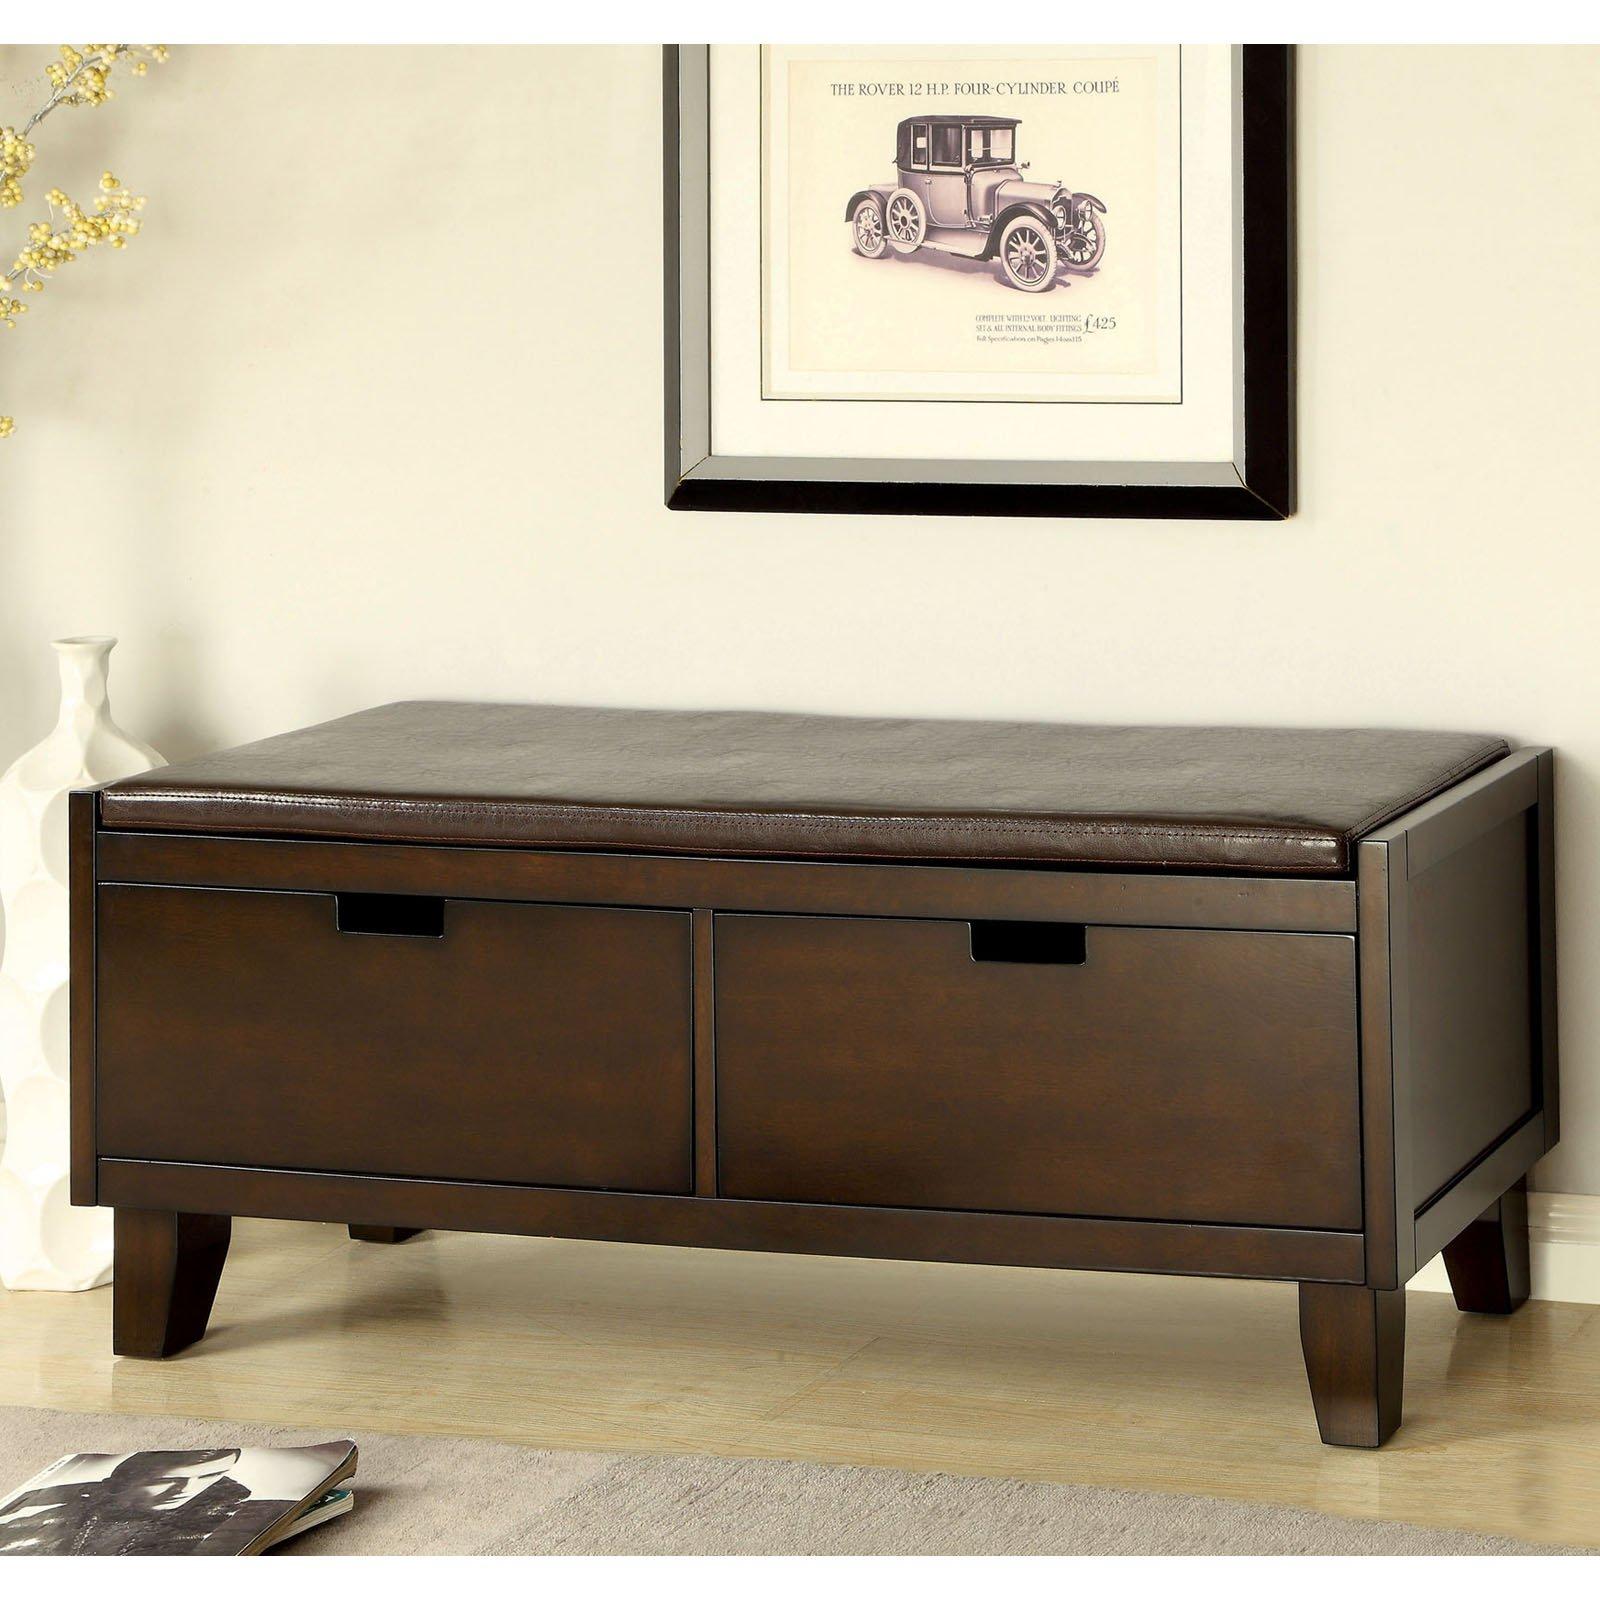 Furniture of America Revelle Padded Leatherette Storage Bench - Walnut